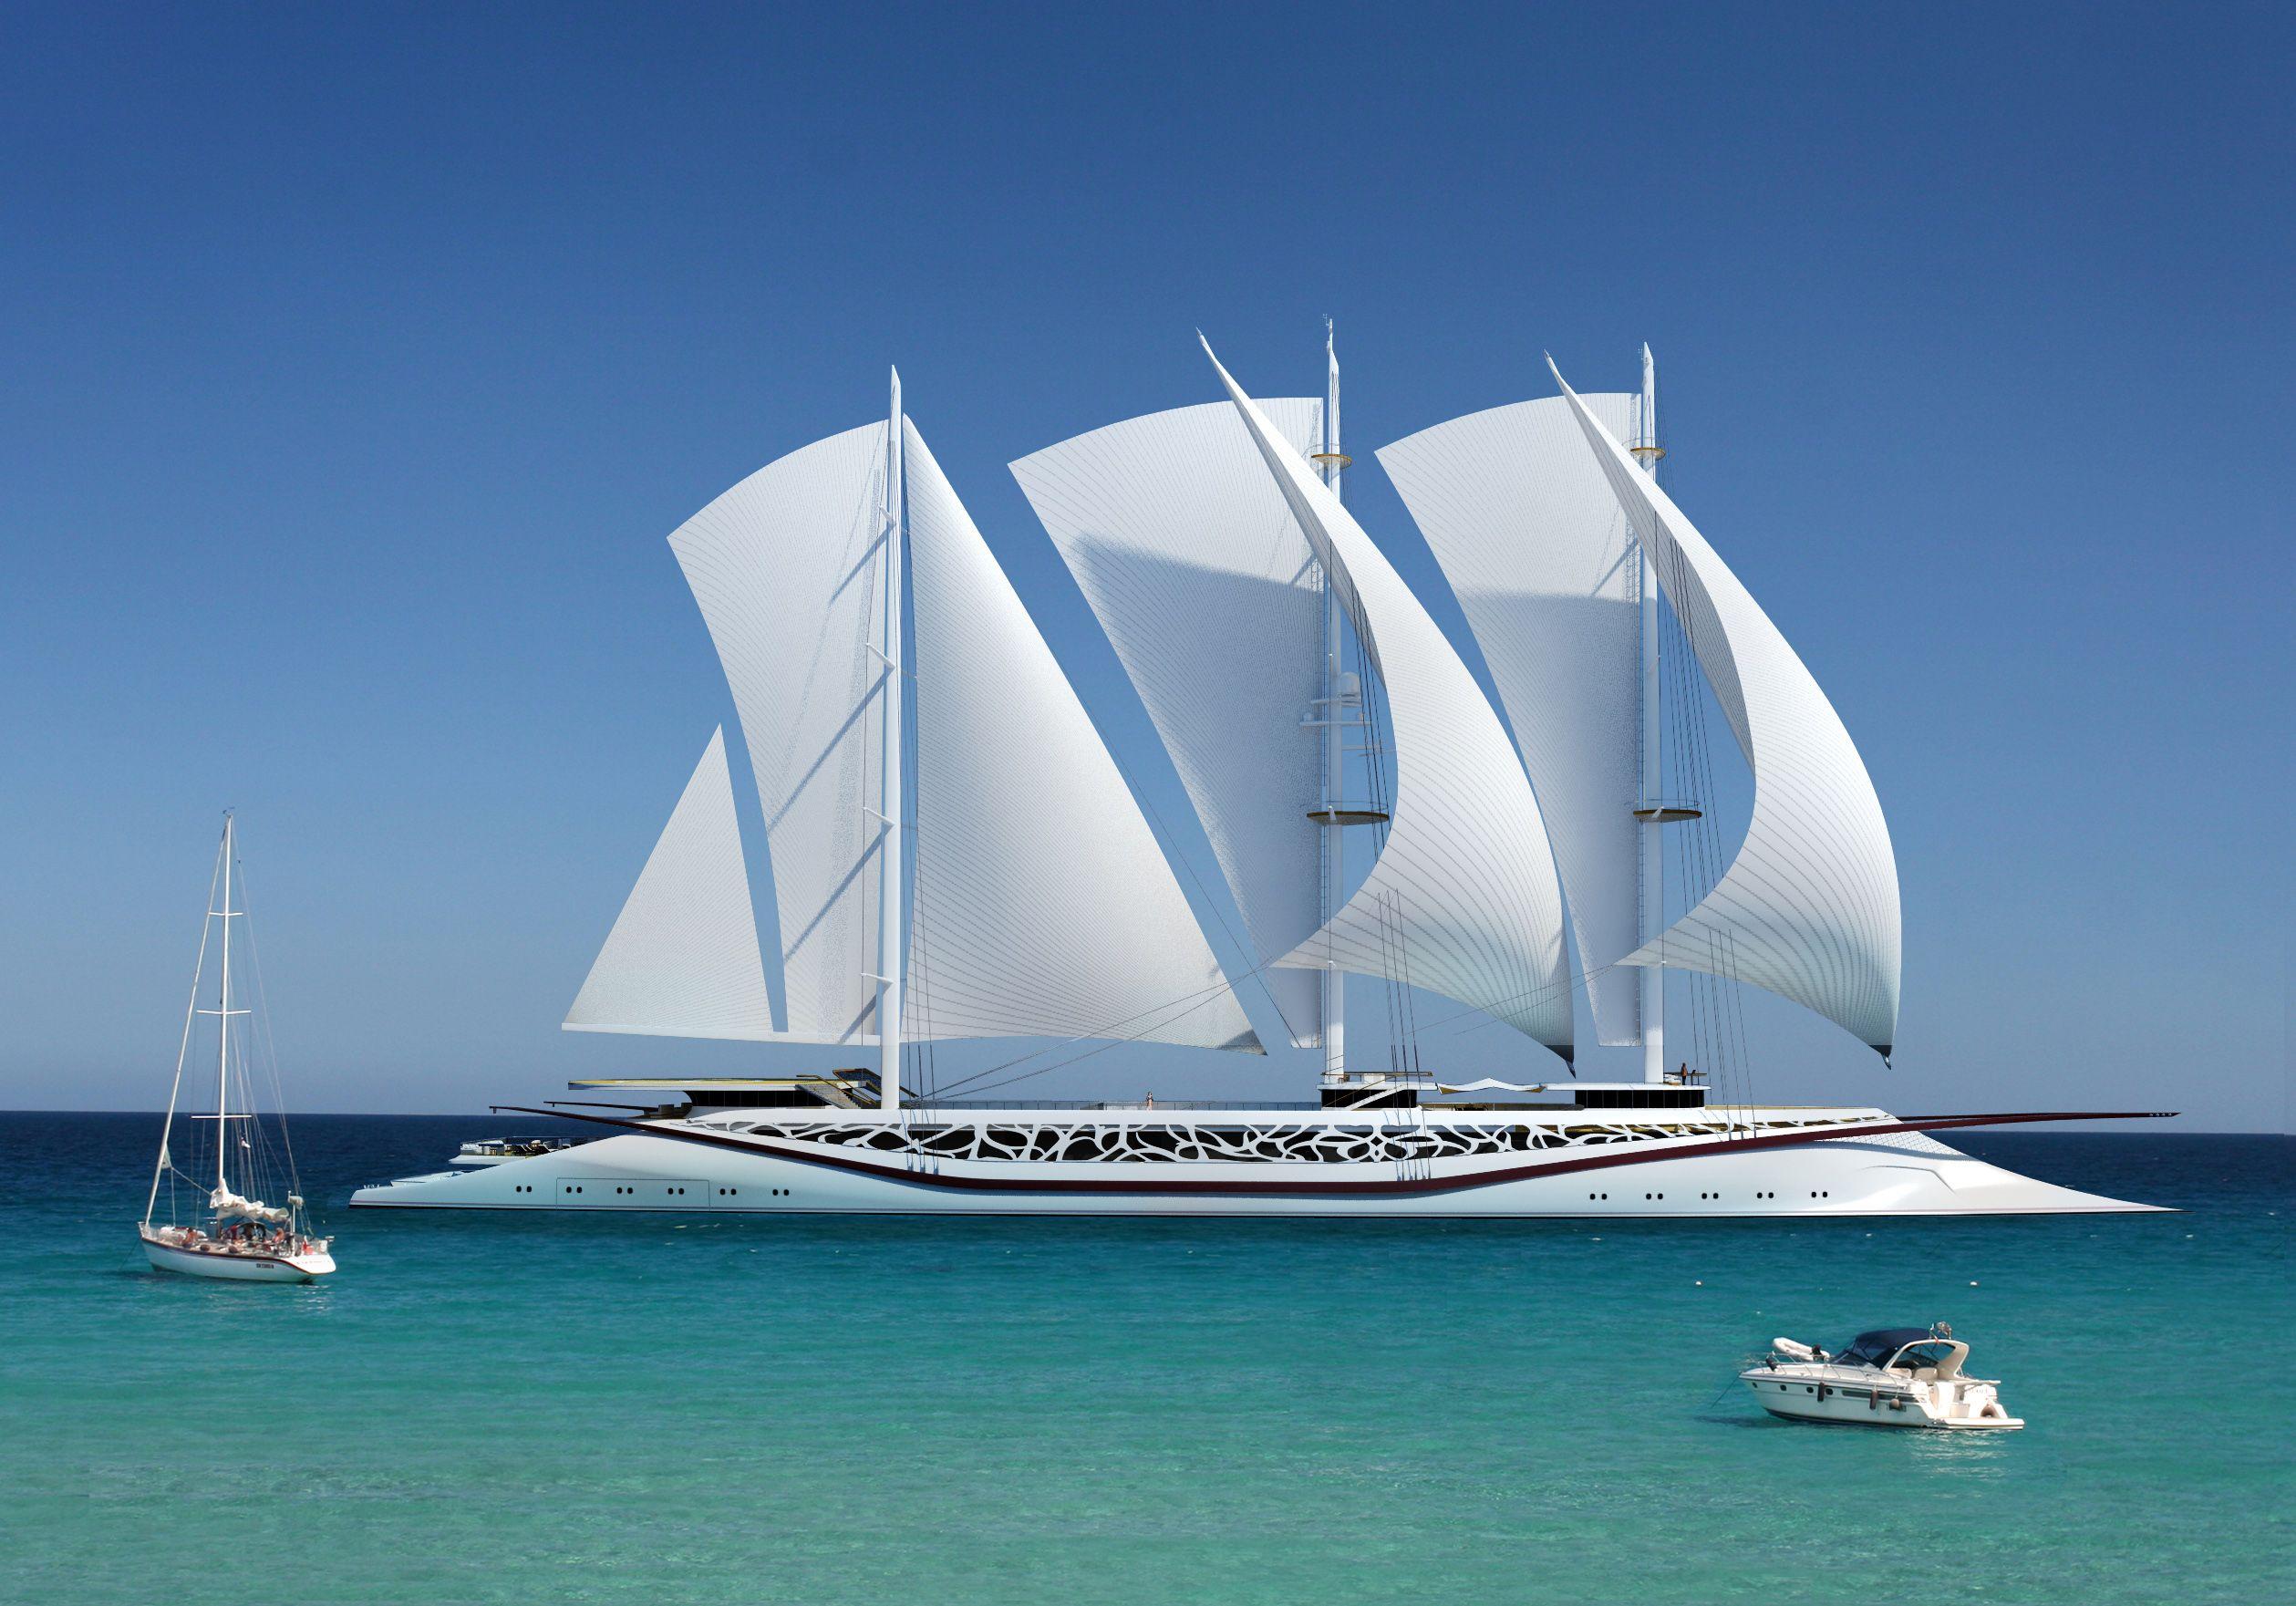 Phoenicia Sailing Yacht concept by Igor Lobanov